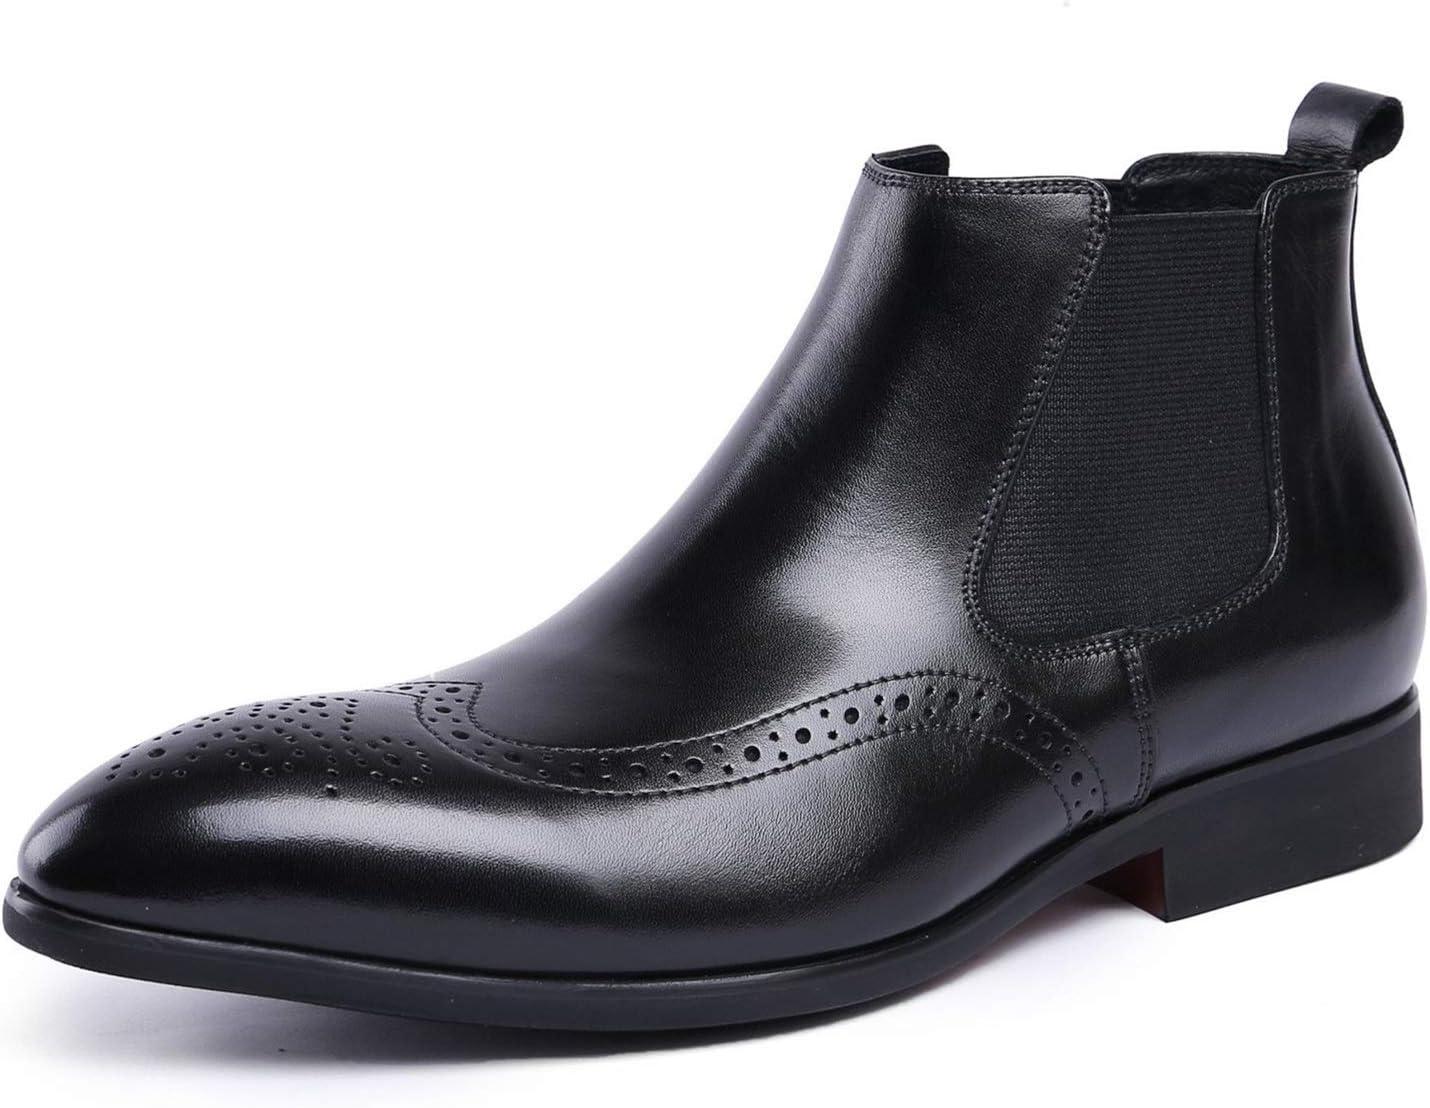 Rui Landed Premium Genuine 2021 model Leather Work Men for Chelsea Boo Boot Very popular!